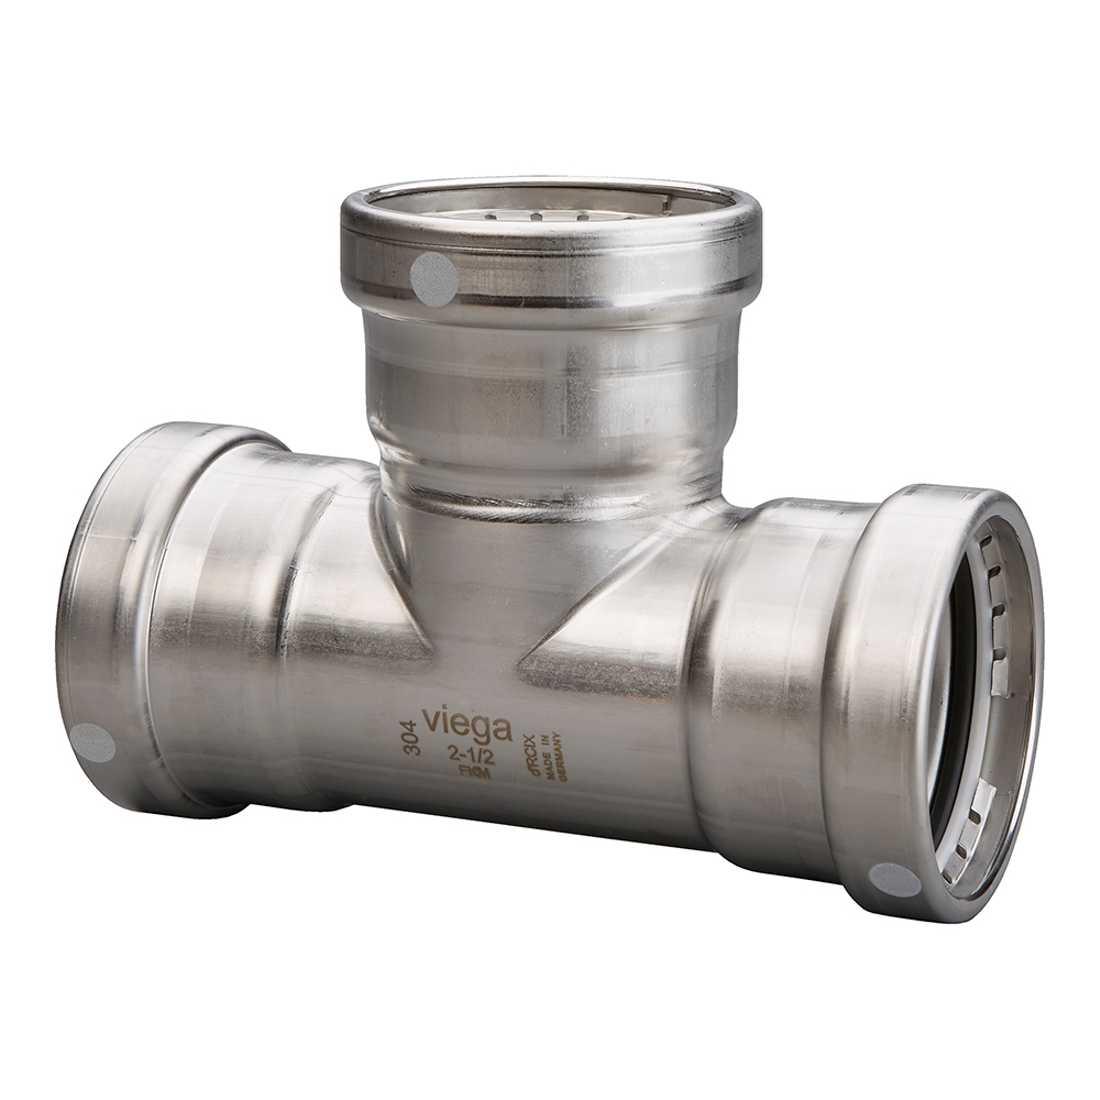 85915 P1: 304 Stainless Steel Viega Propress XL Tee